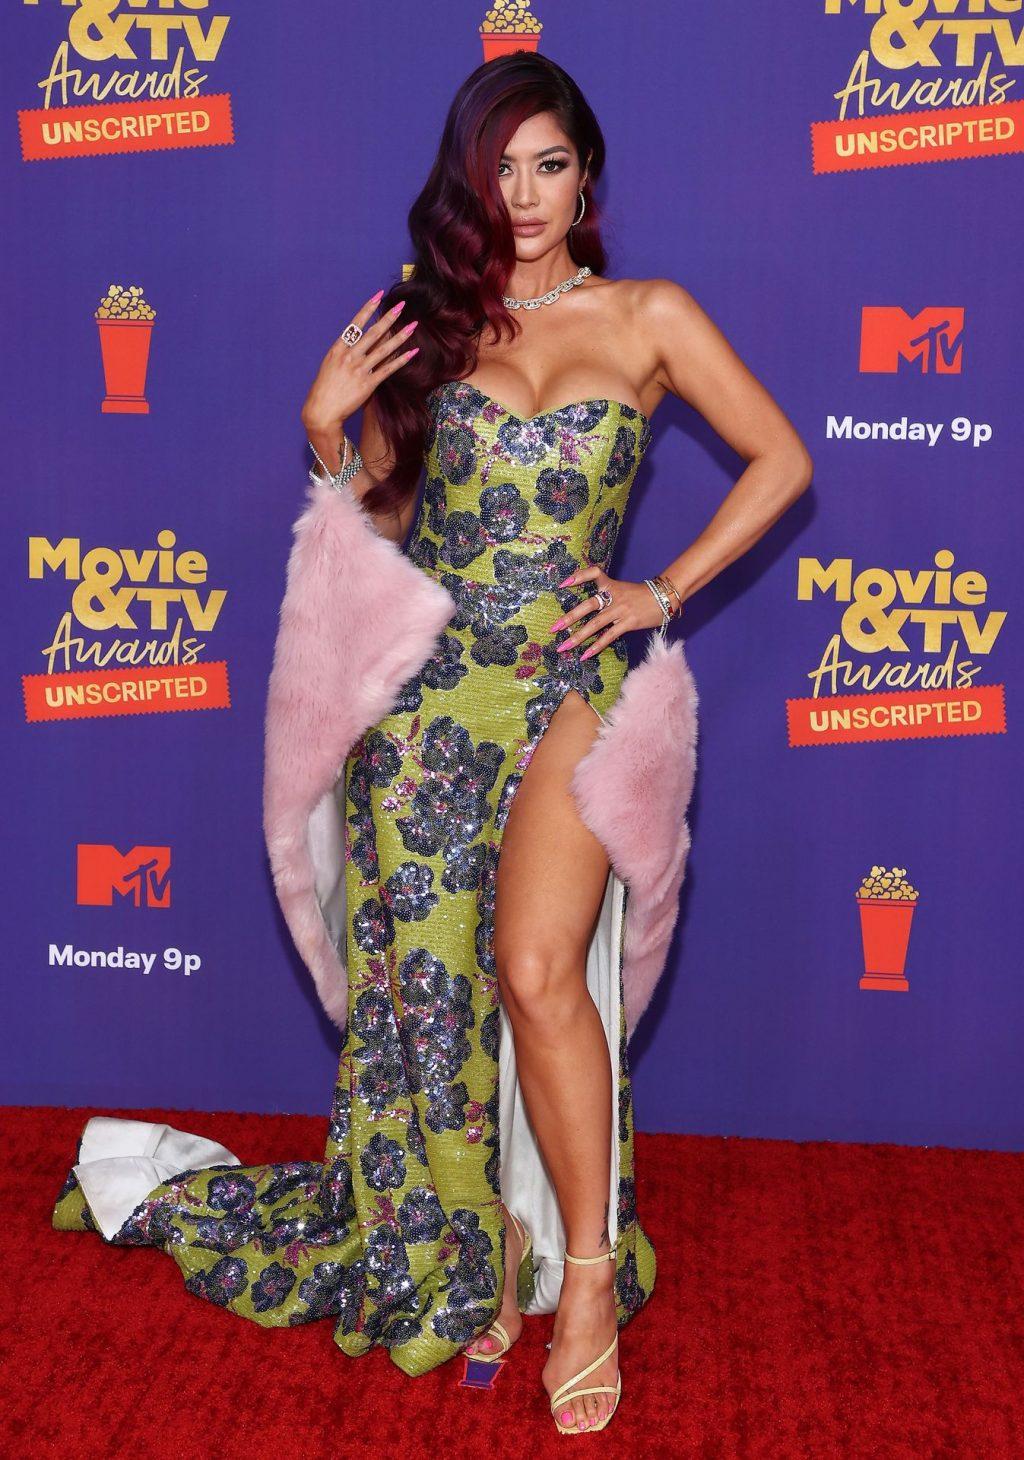 Kim Lee Flaunts Her Stunning Figure at the 2021 MTV Movie & TV Awards (13 Photos + Videos)